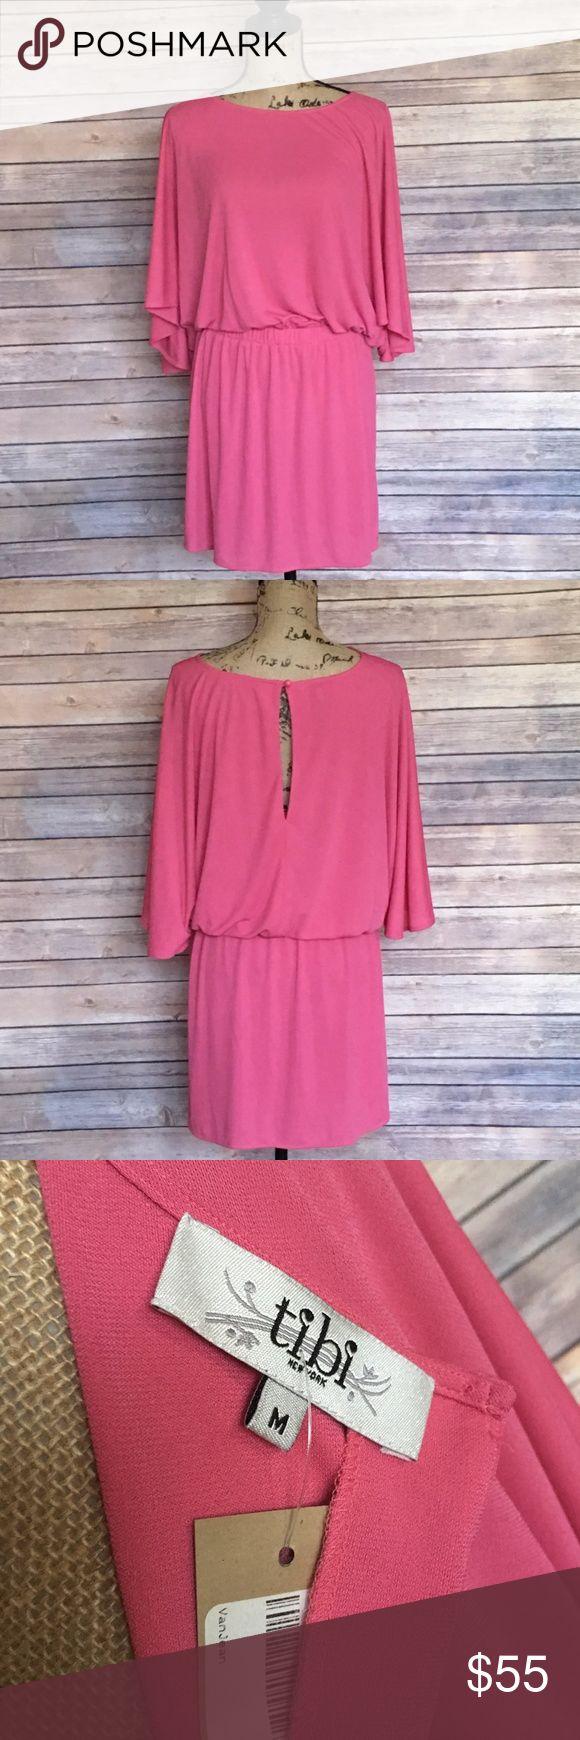 Tibi Copa Cobana Dress NEW Size Medium Tibi Pink Copa Cobana Dress Stretchy Waist Keyhole Back Brand New With Tags Tibi Dresses